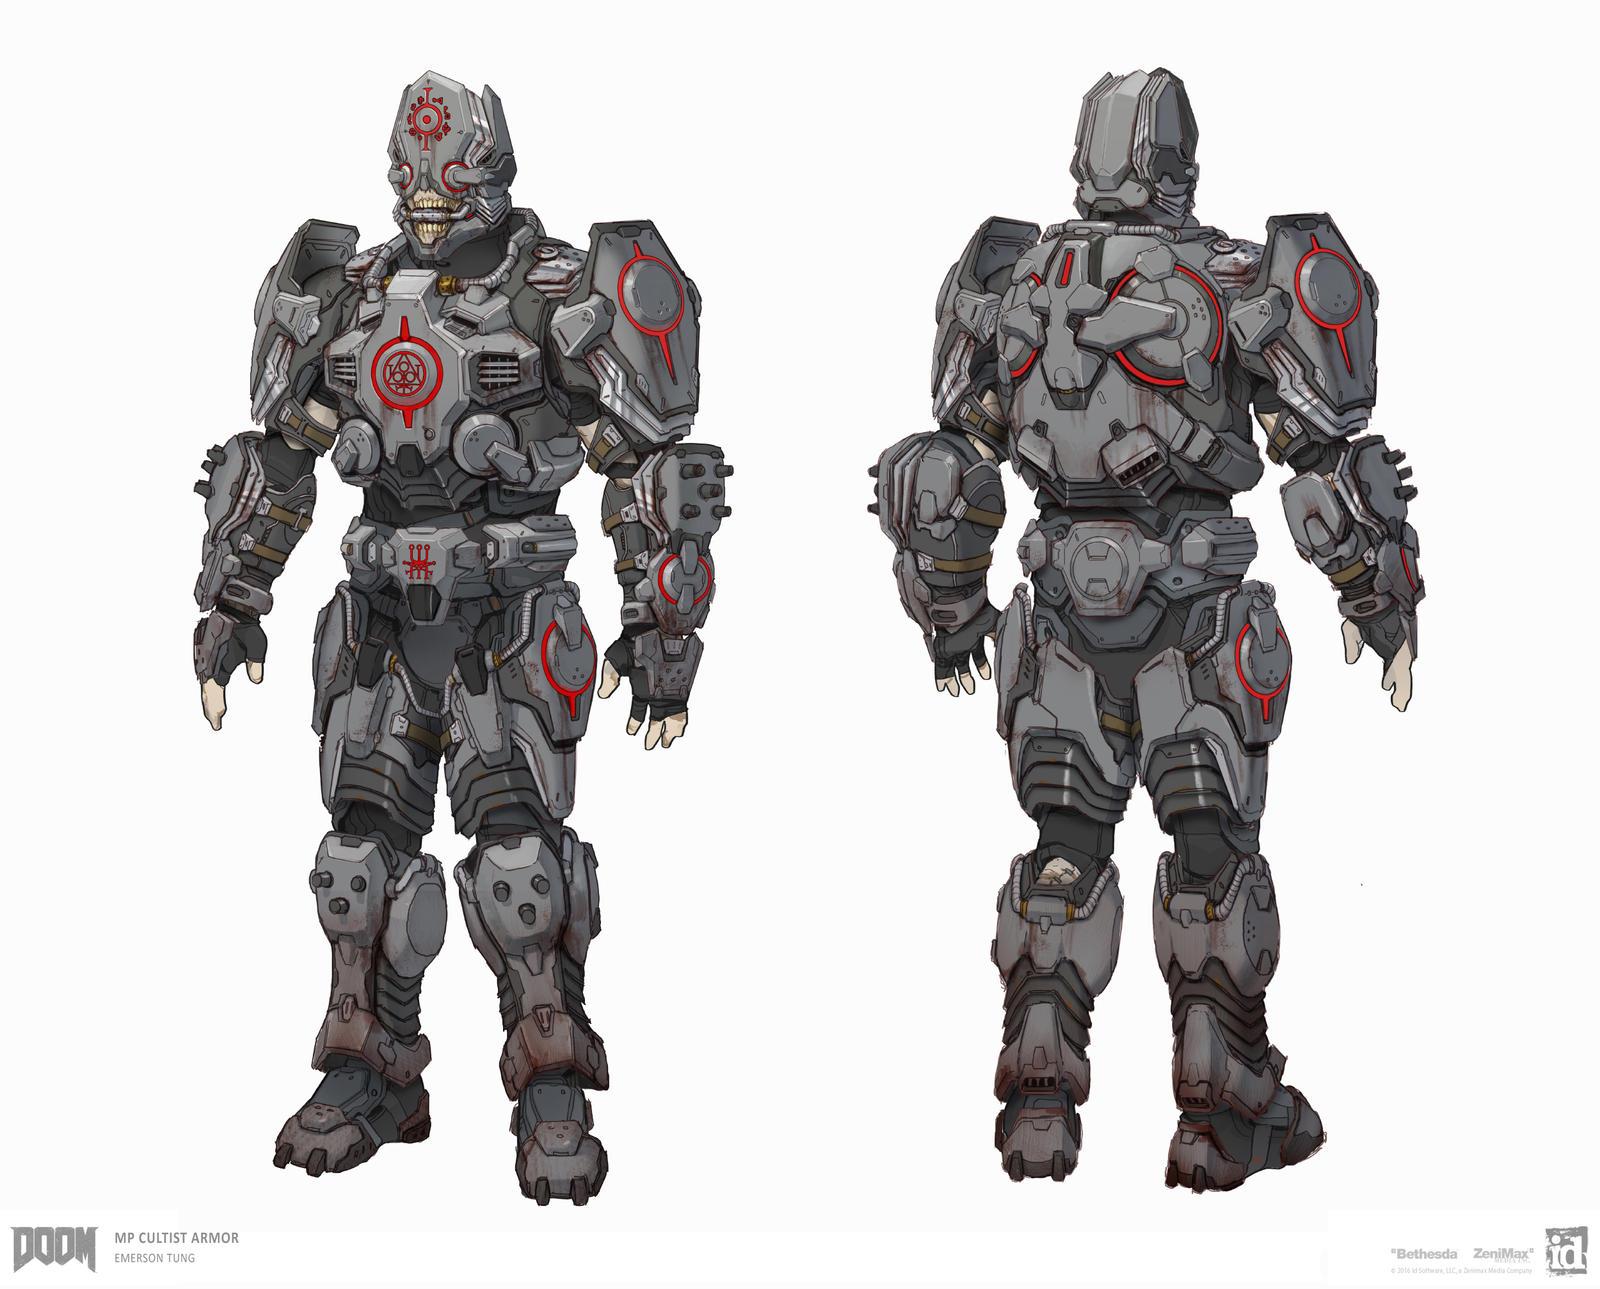 DOOM - MP Cultist Armor Set